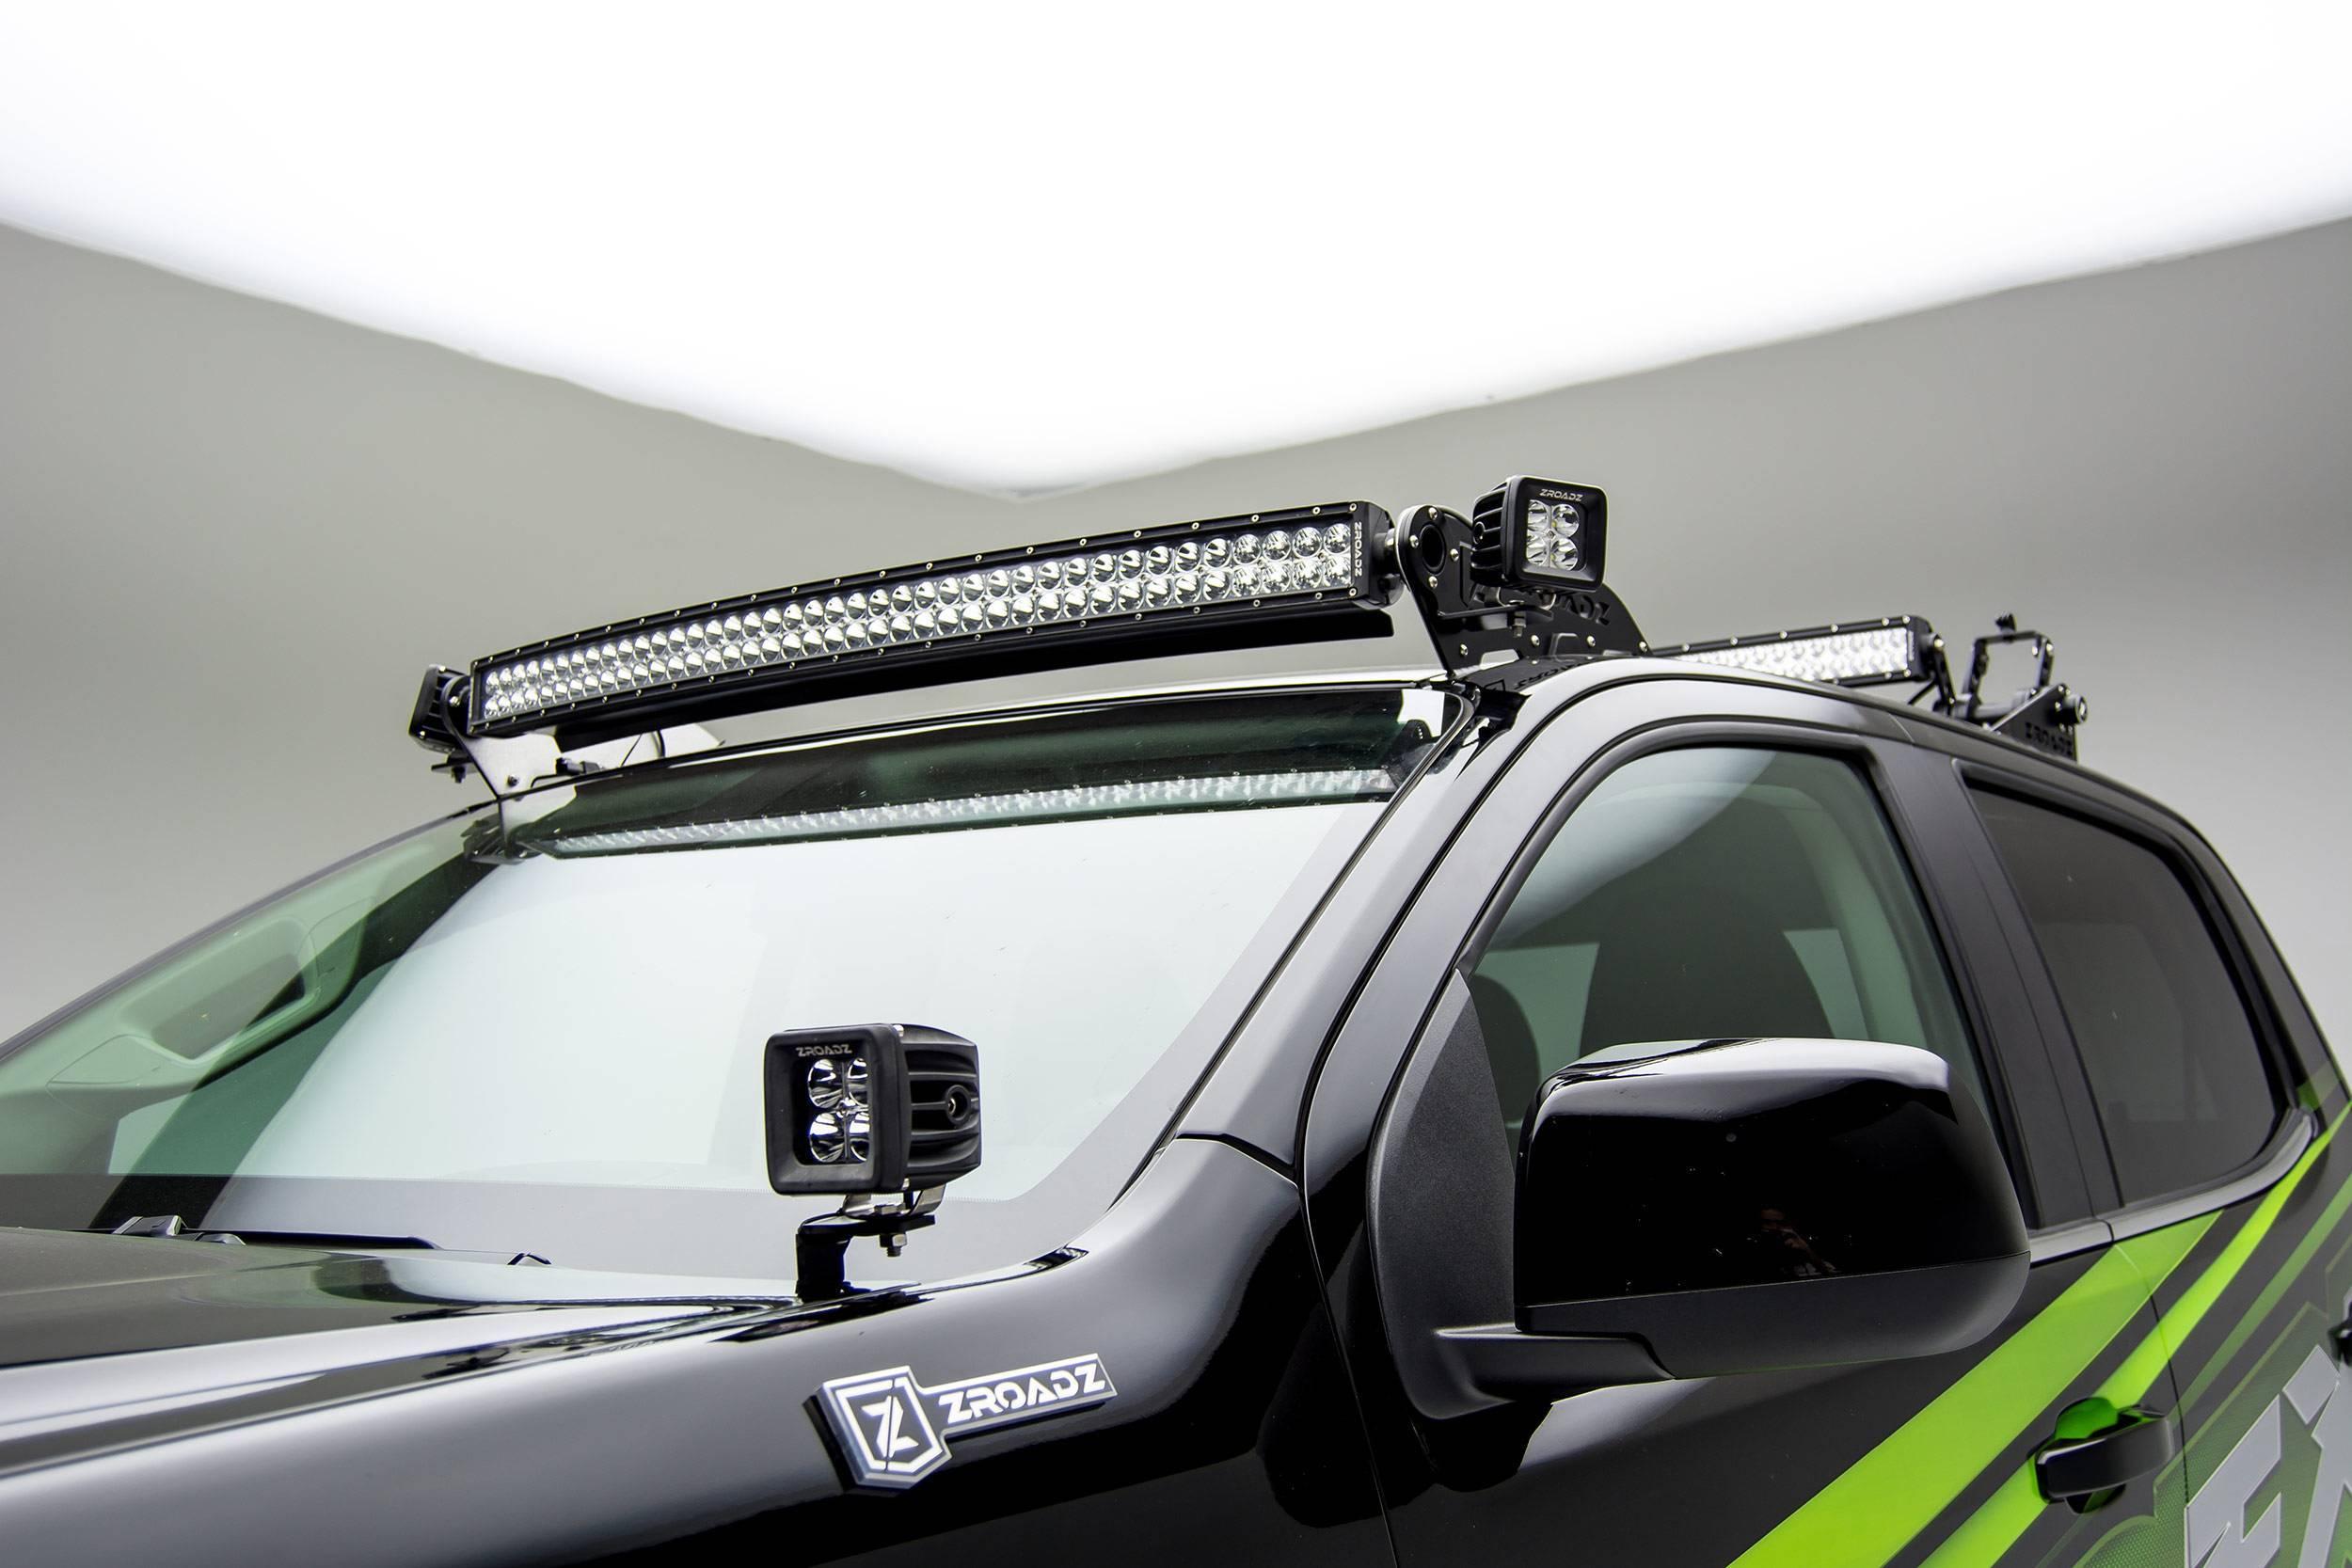 ZROADZ OFF ROAD PRODUCTS - 2015-2020 Colorado, Canyon Hood Hinge LED Bracket to mount (2) 3 Inch LED Pod Lights - PN #Z362671